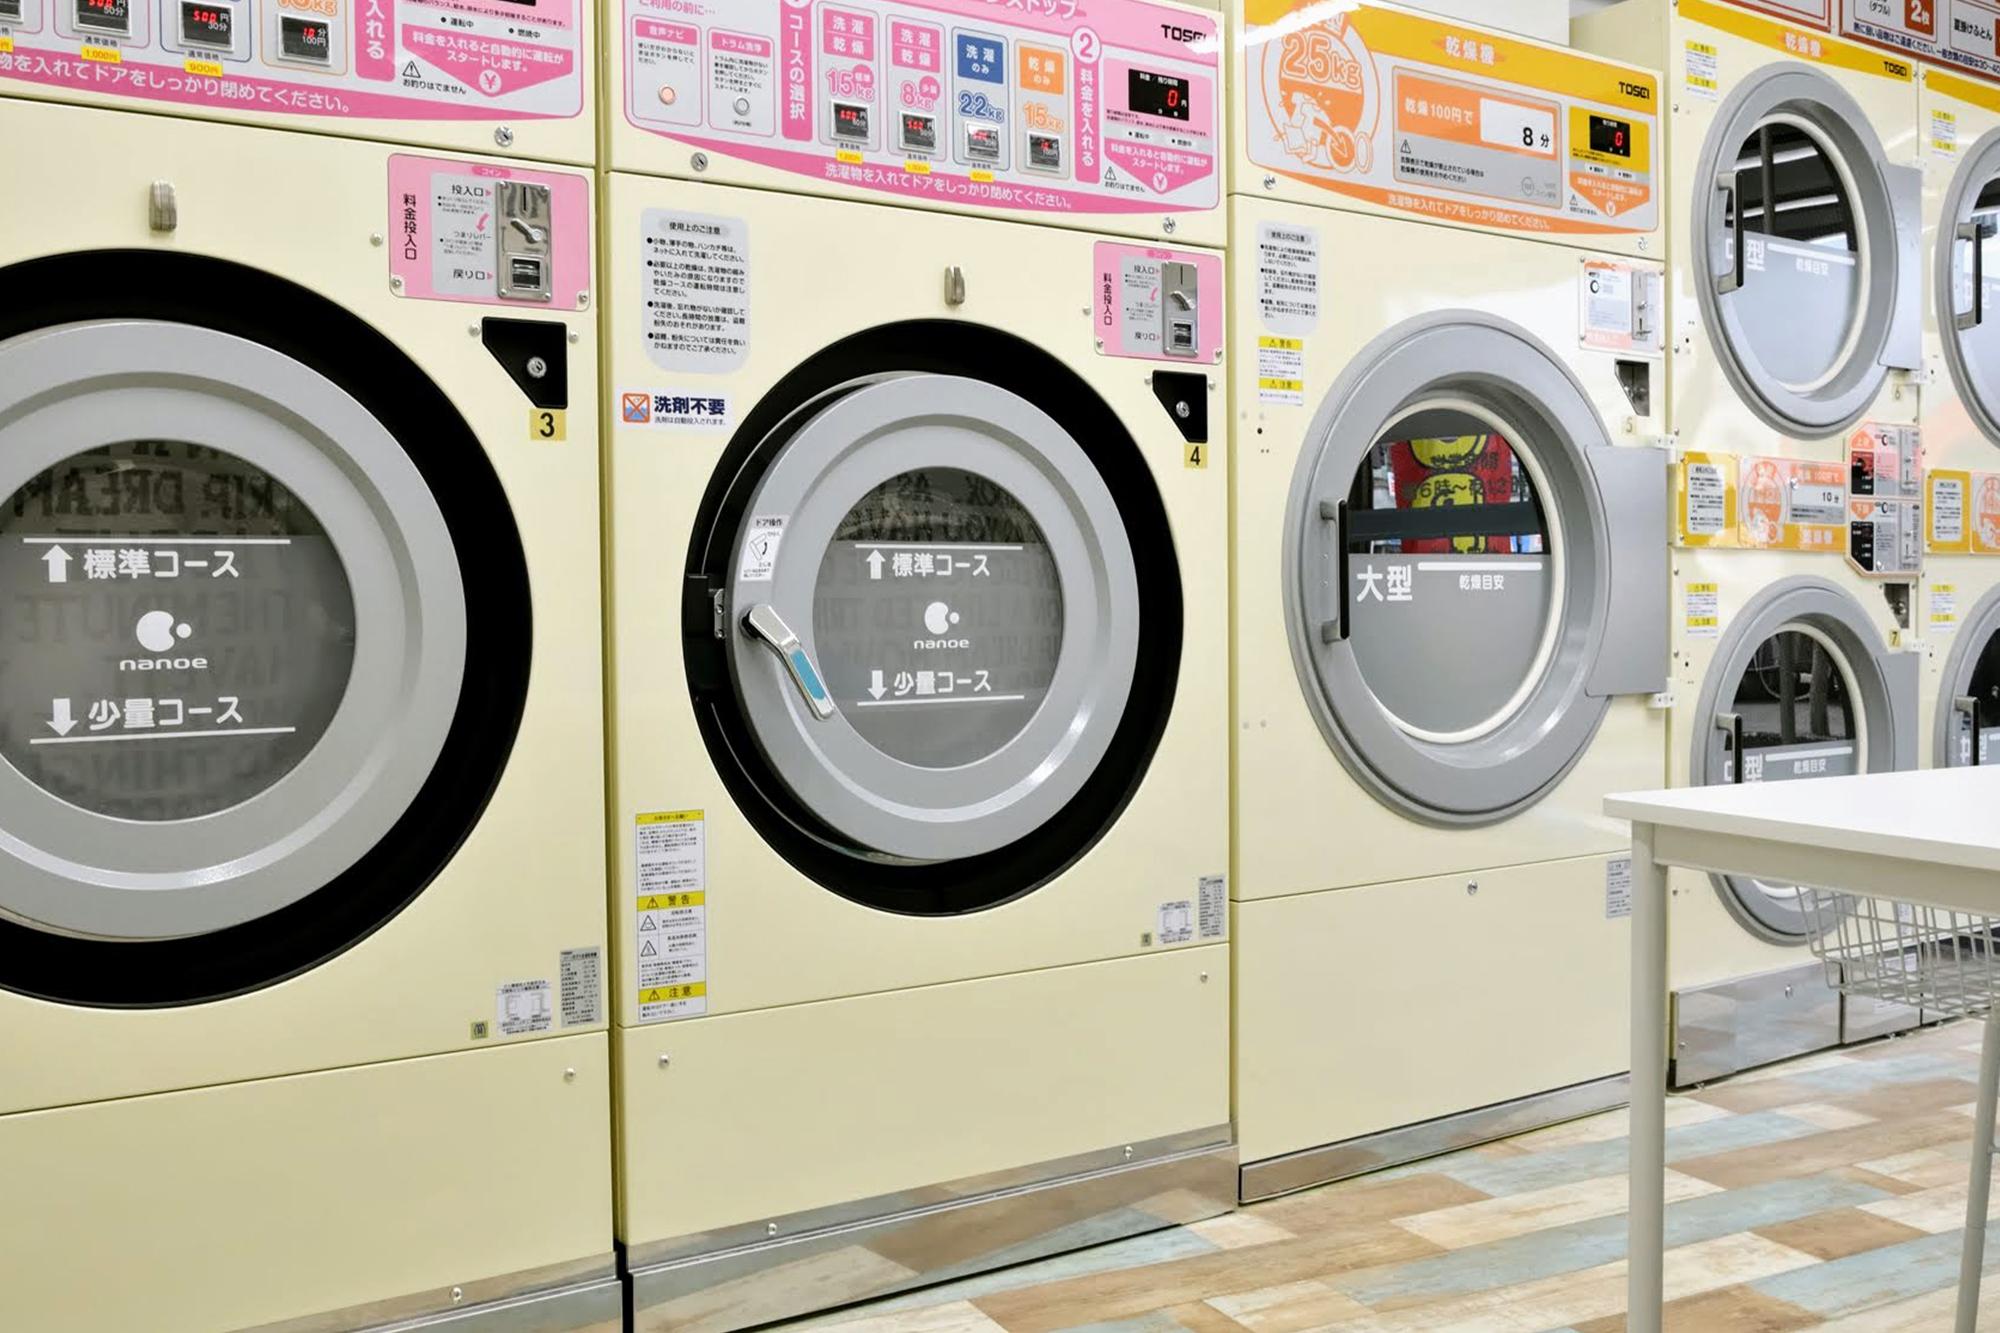 COIN LAUNDRY A&C - senbayashi 画像2